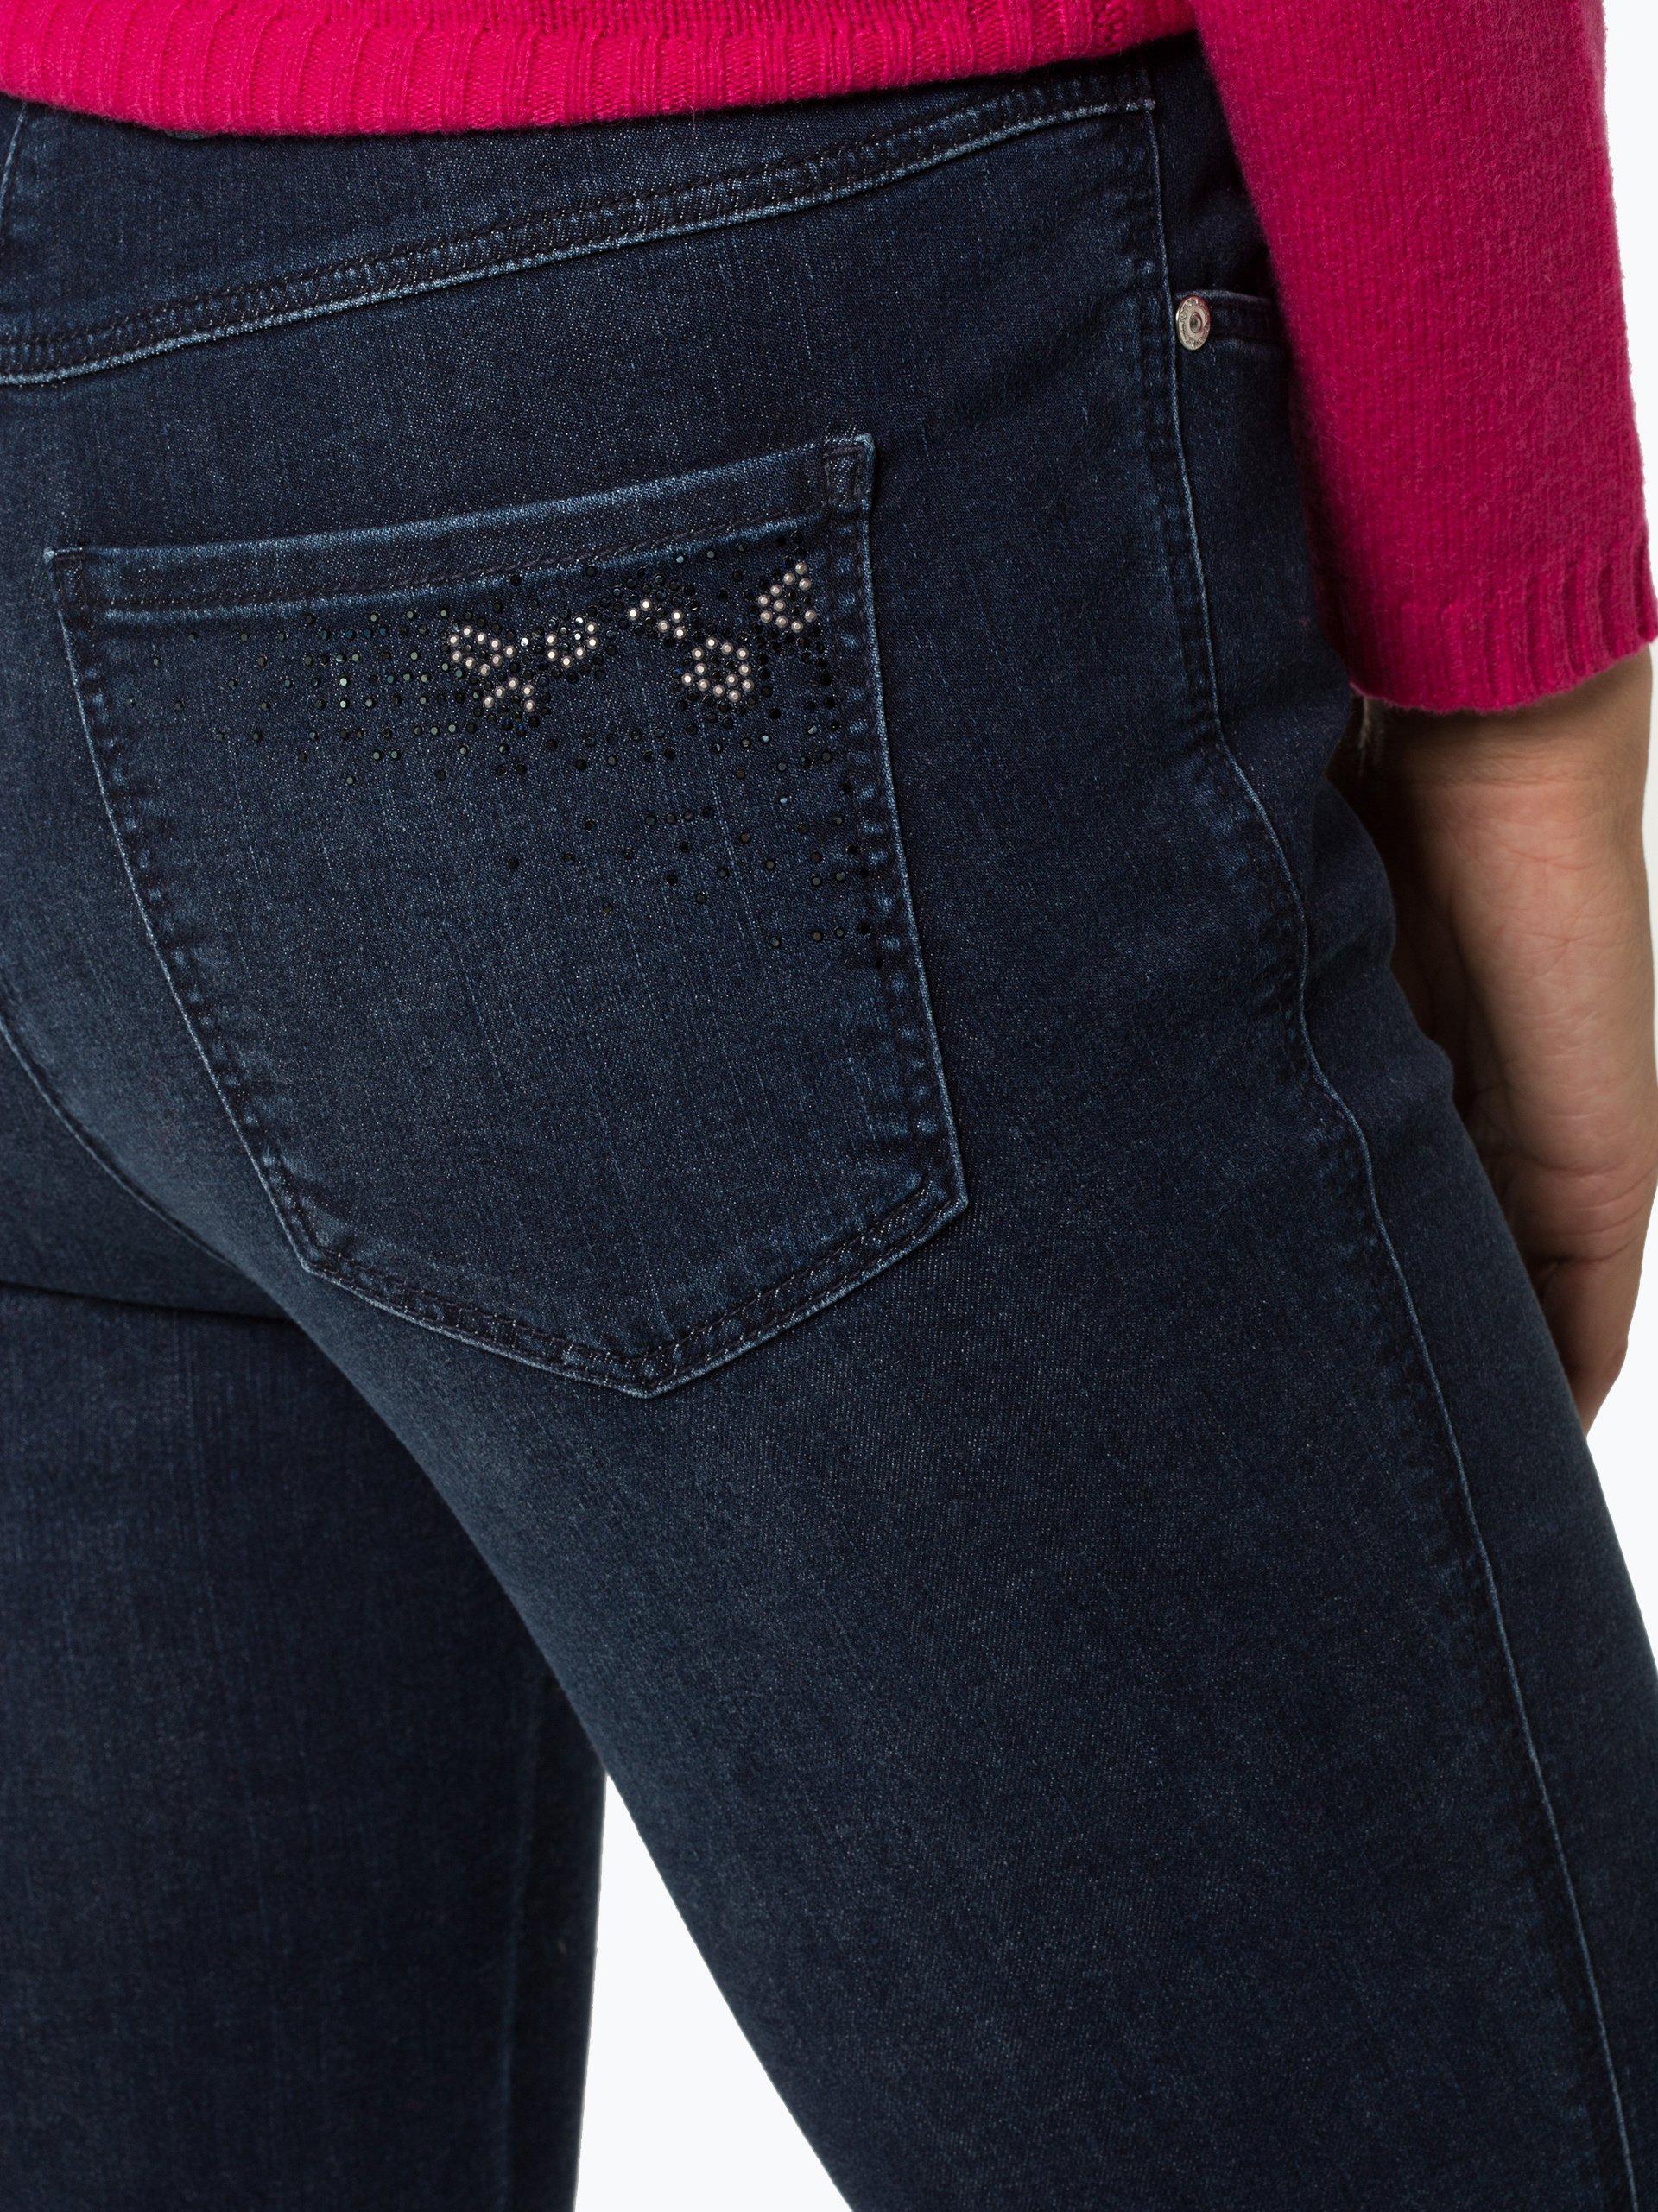 c6cf766db48a1a Toni Dress Damen Jeans - CS be loved online kaufen   VANGRAAF.COM